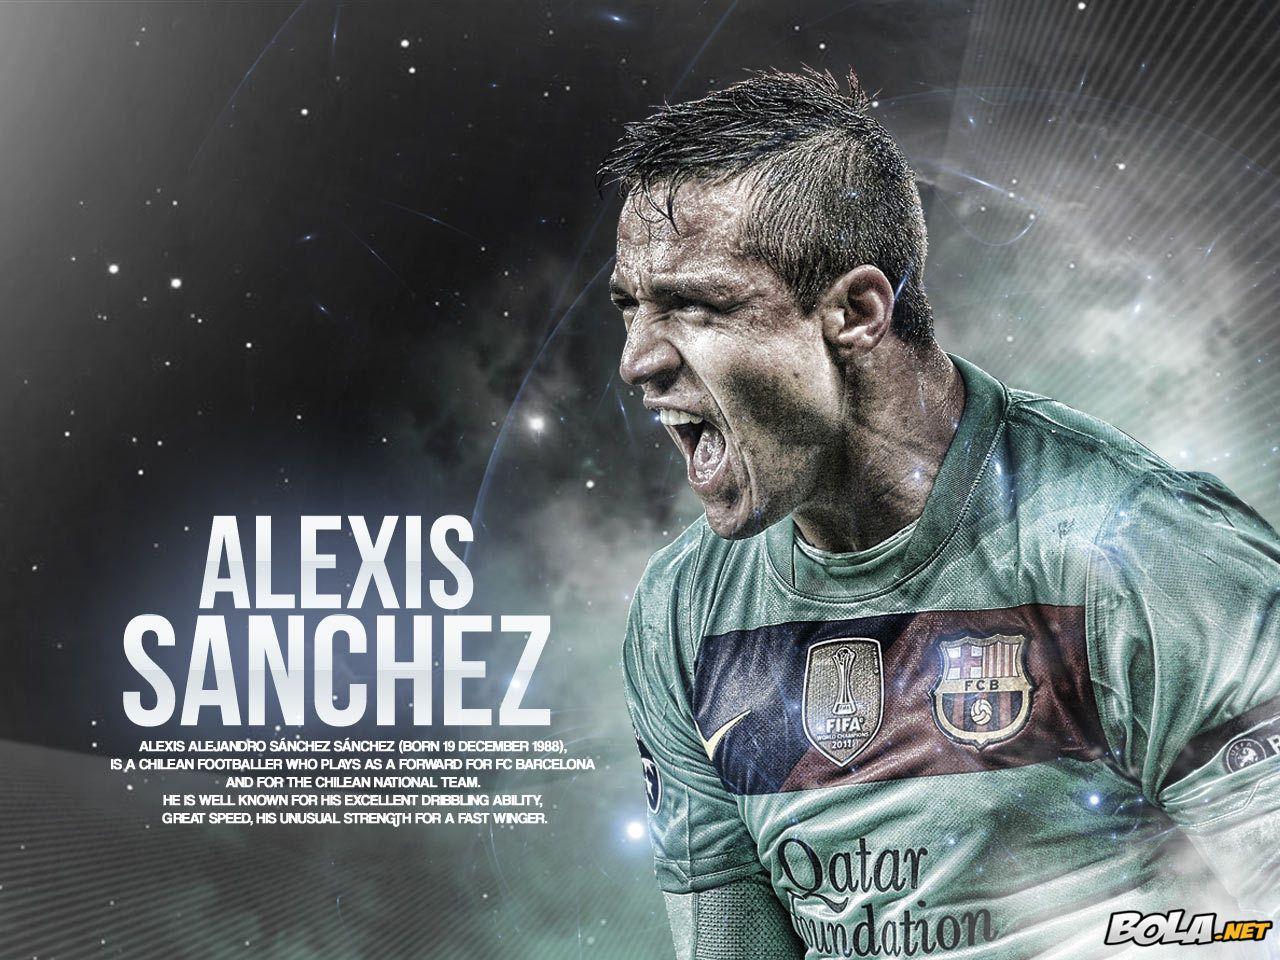 AlexisSanchezWallpaper2014 Alexis sanchez, Alejandro